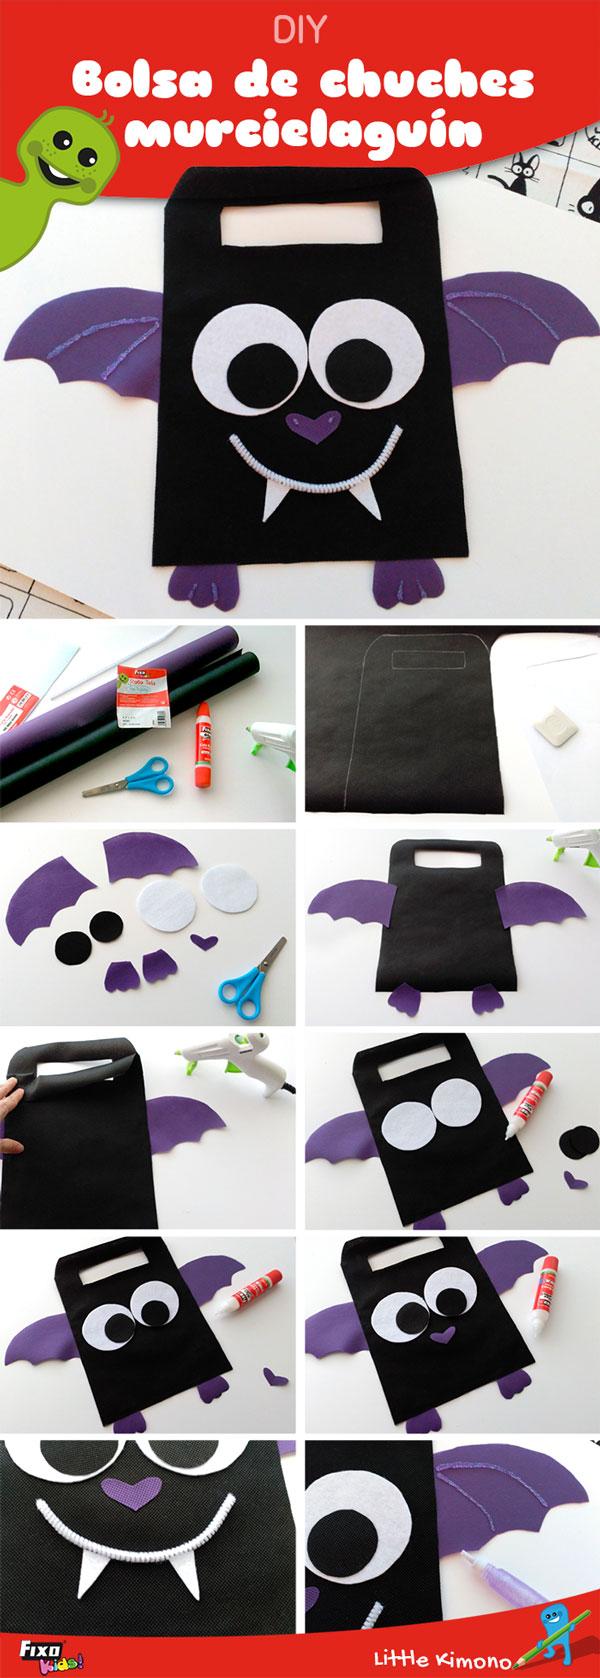 tutorial bolsa chuches murciélago